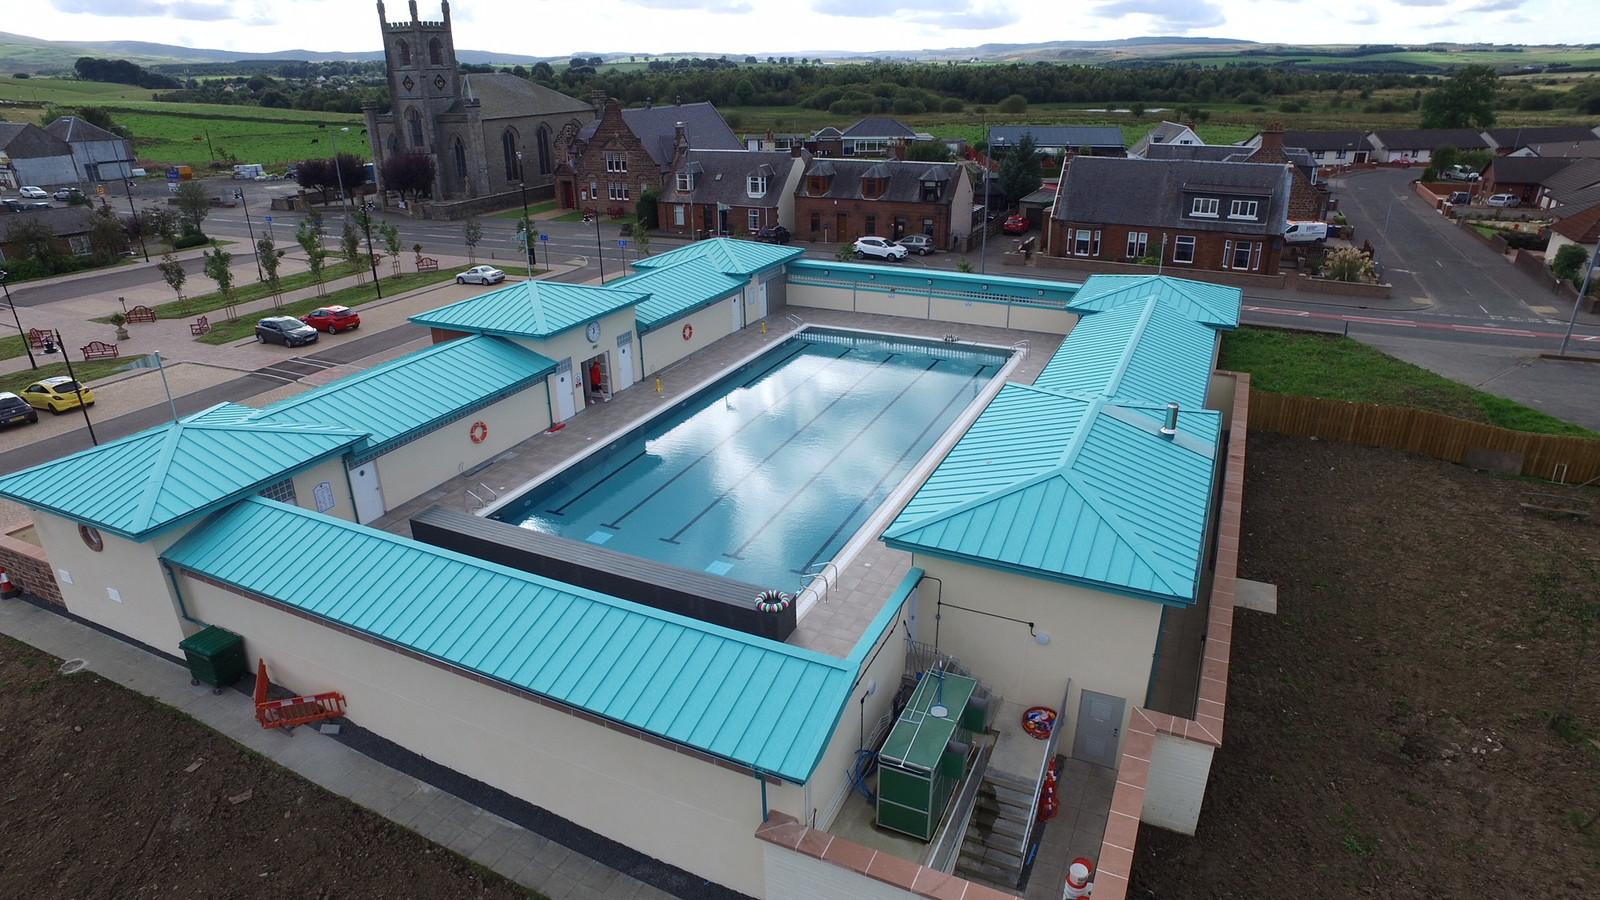 Aerial Eye Scotland Aerial Photography Survey Amp Videography